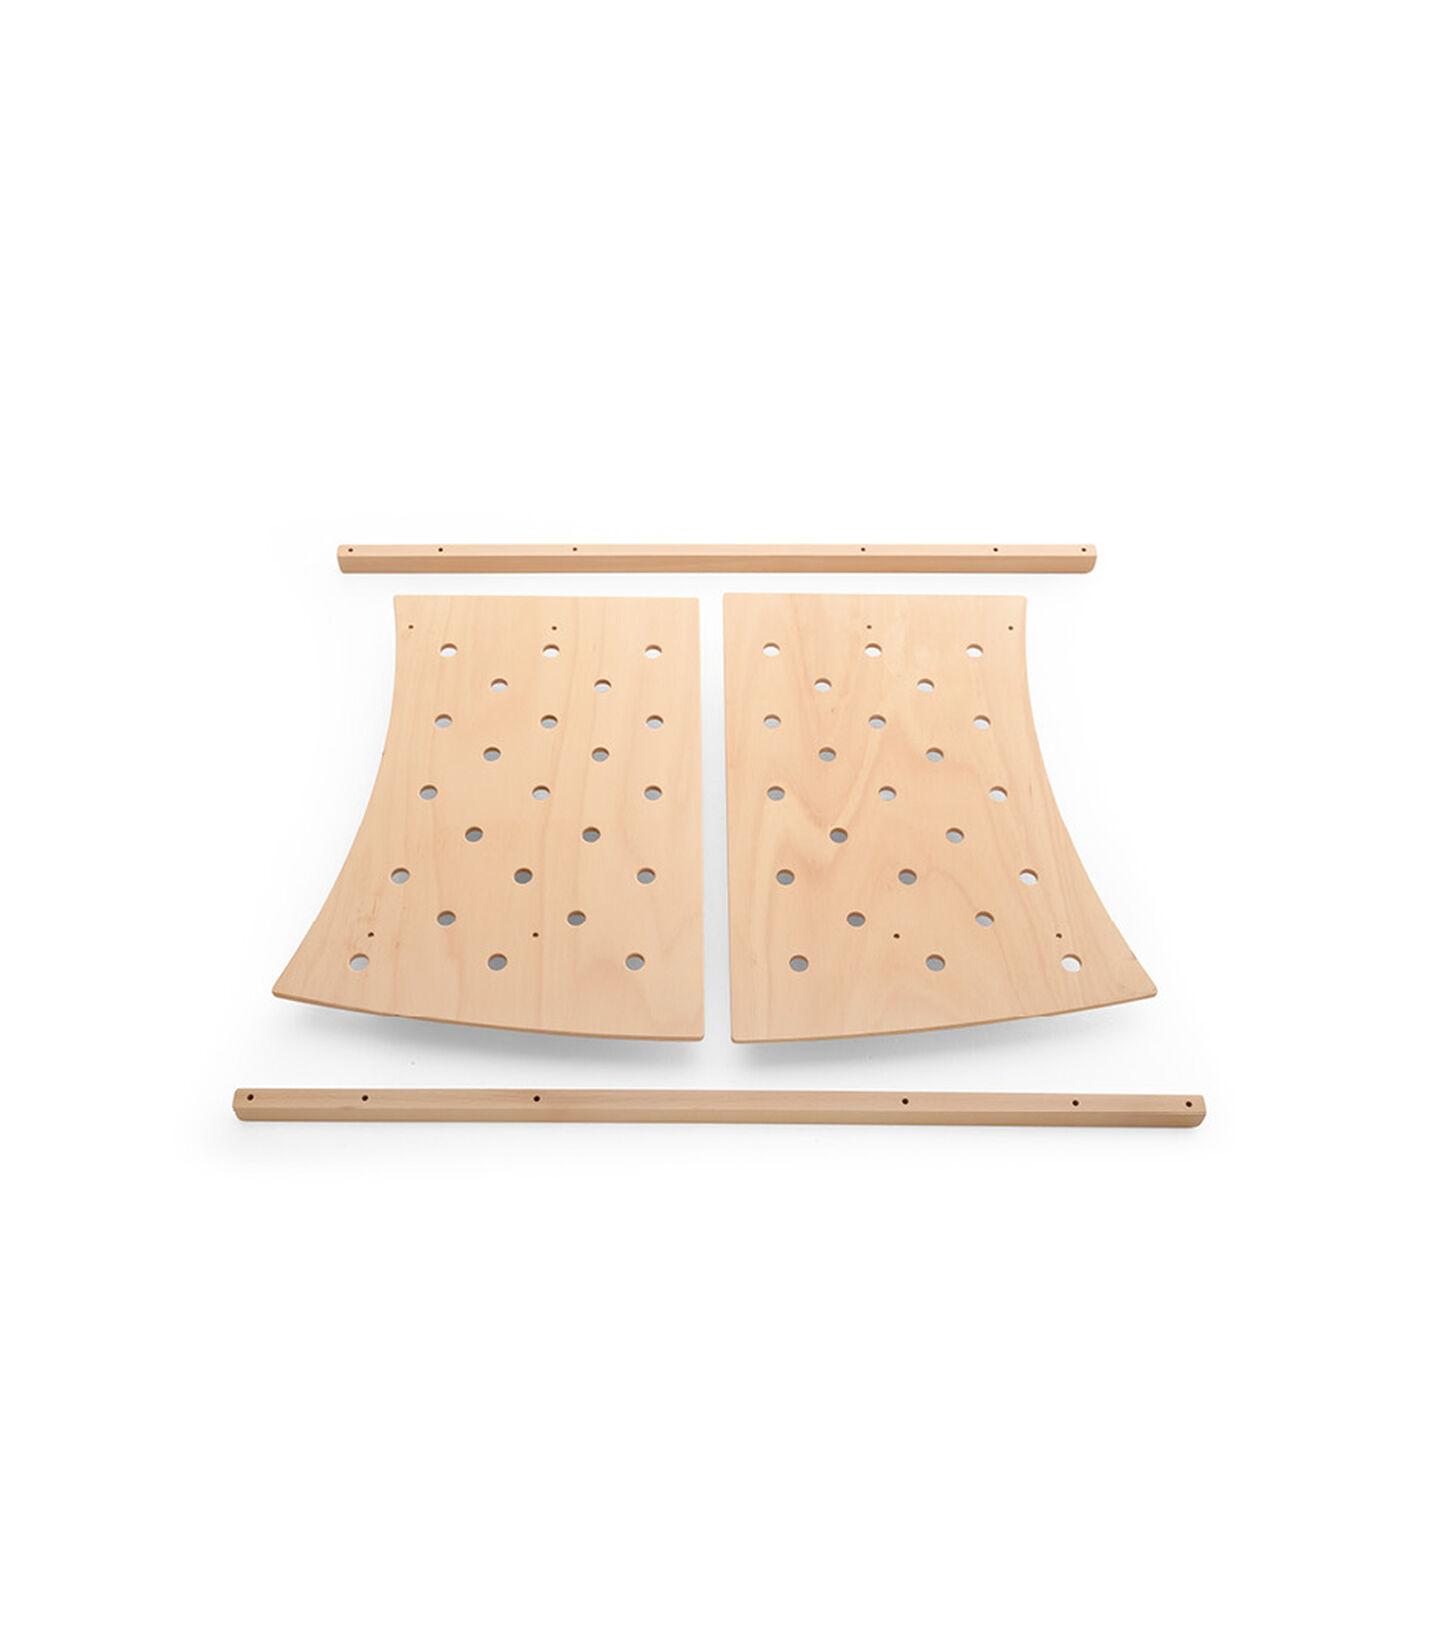 Stokke® Sleepi™ Junior Extension Kit, Natural. view 2